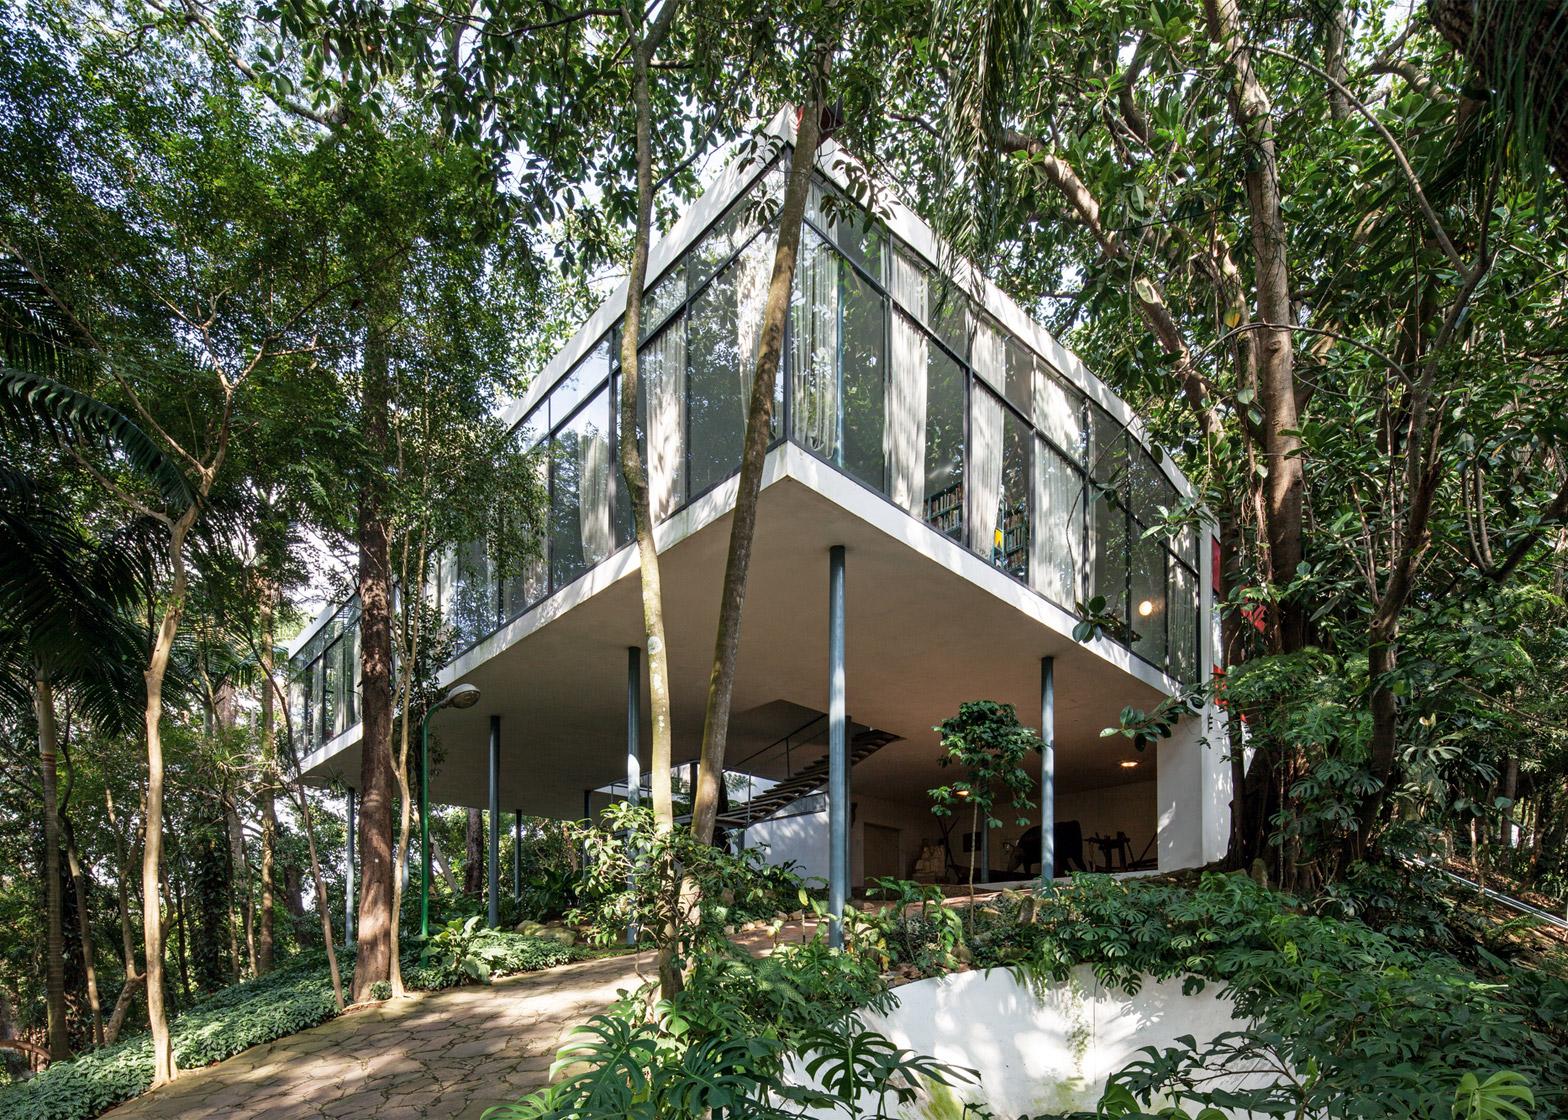 Casa de Vidro, Brazil, by Lina Bo Bardi